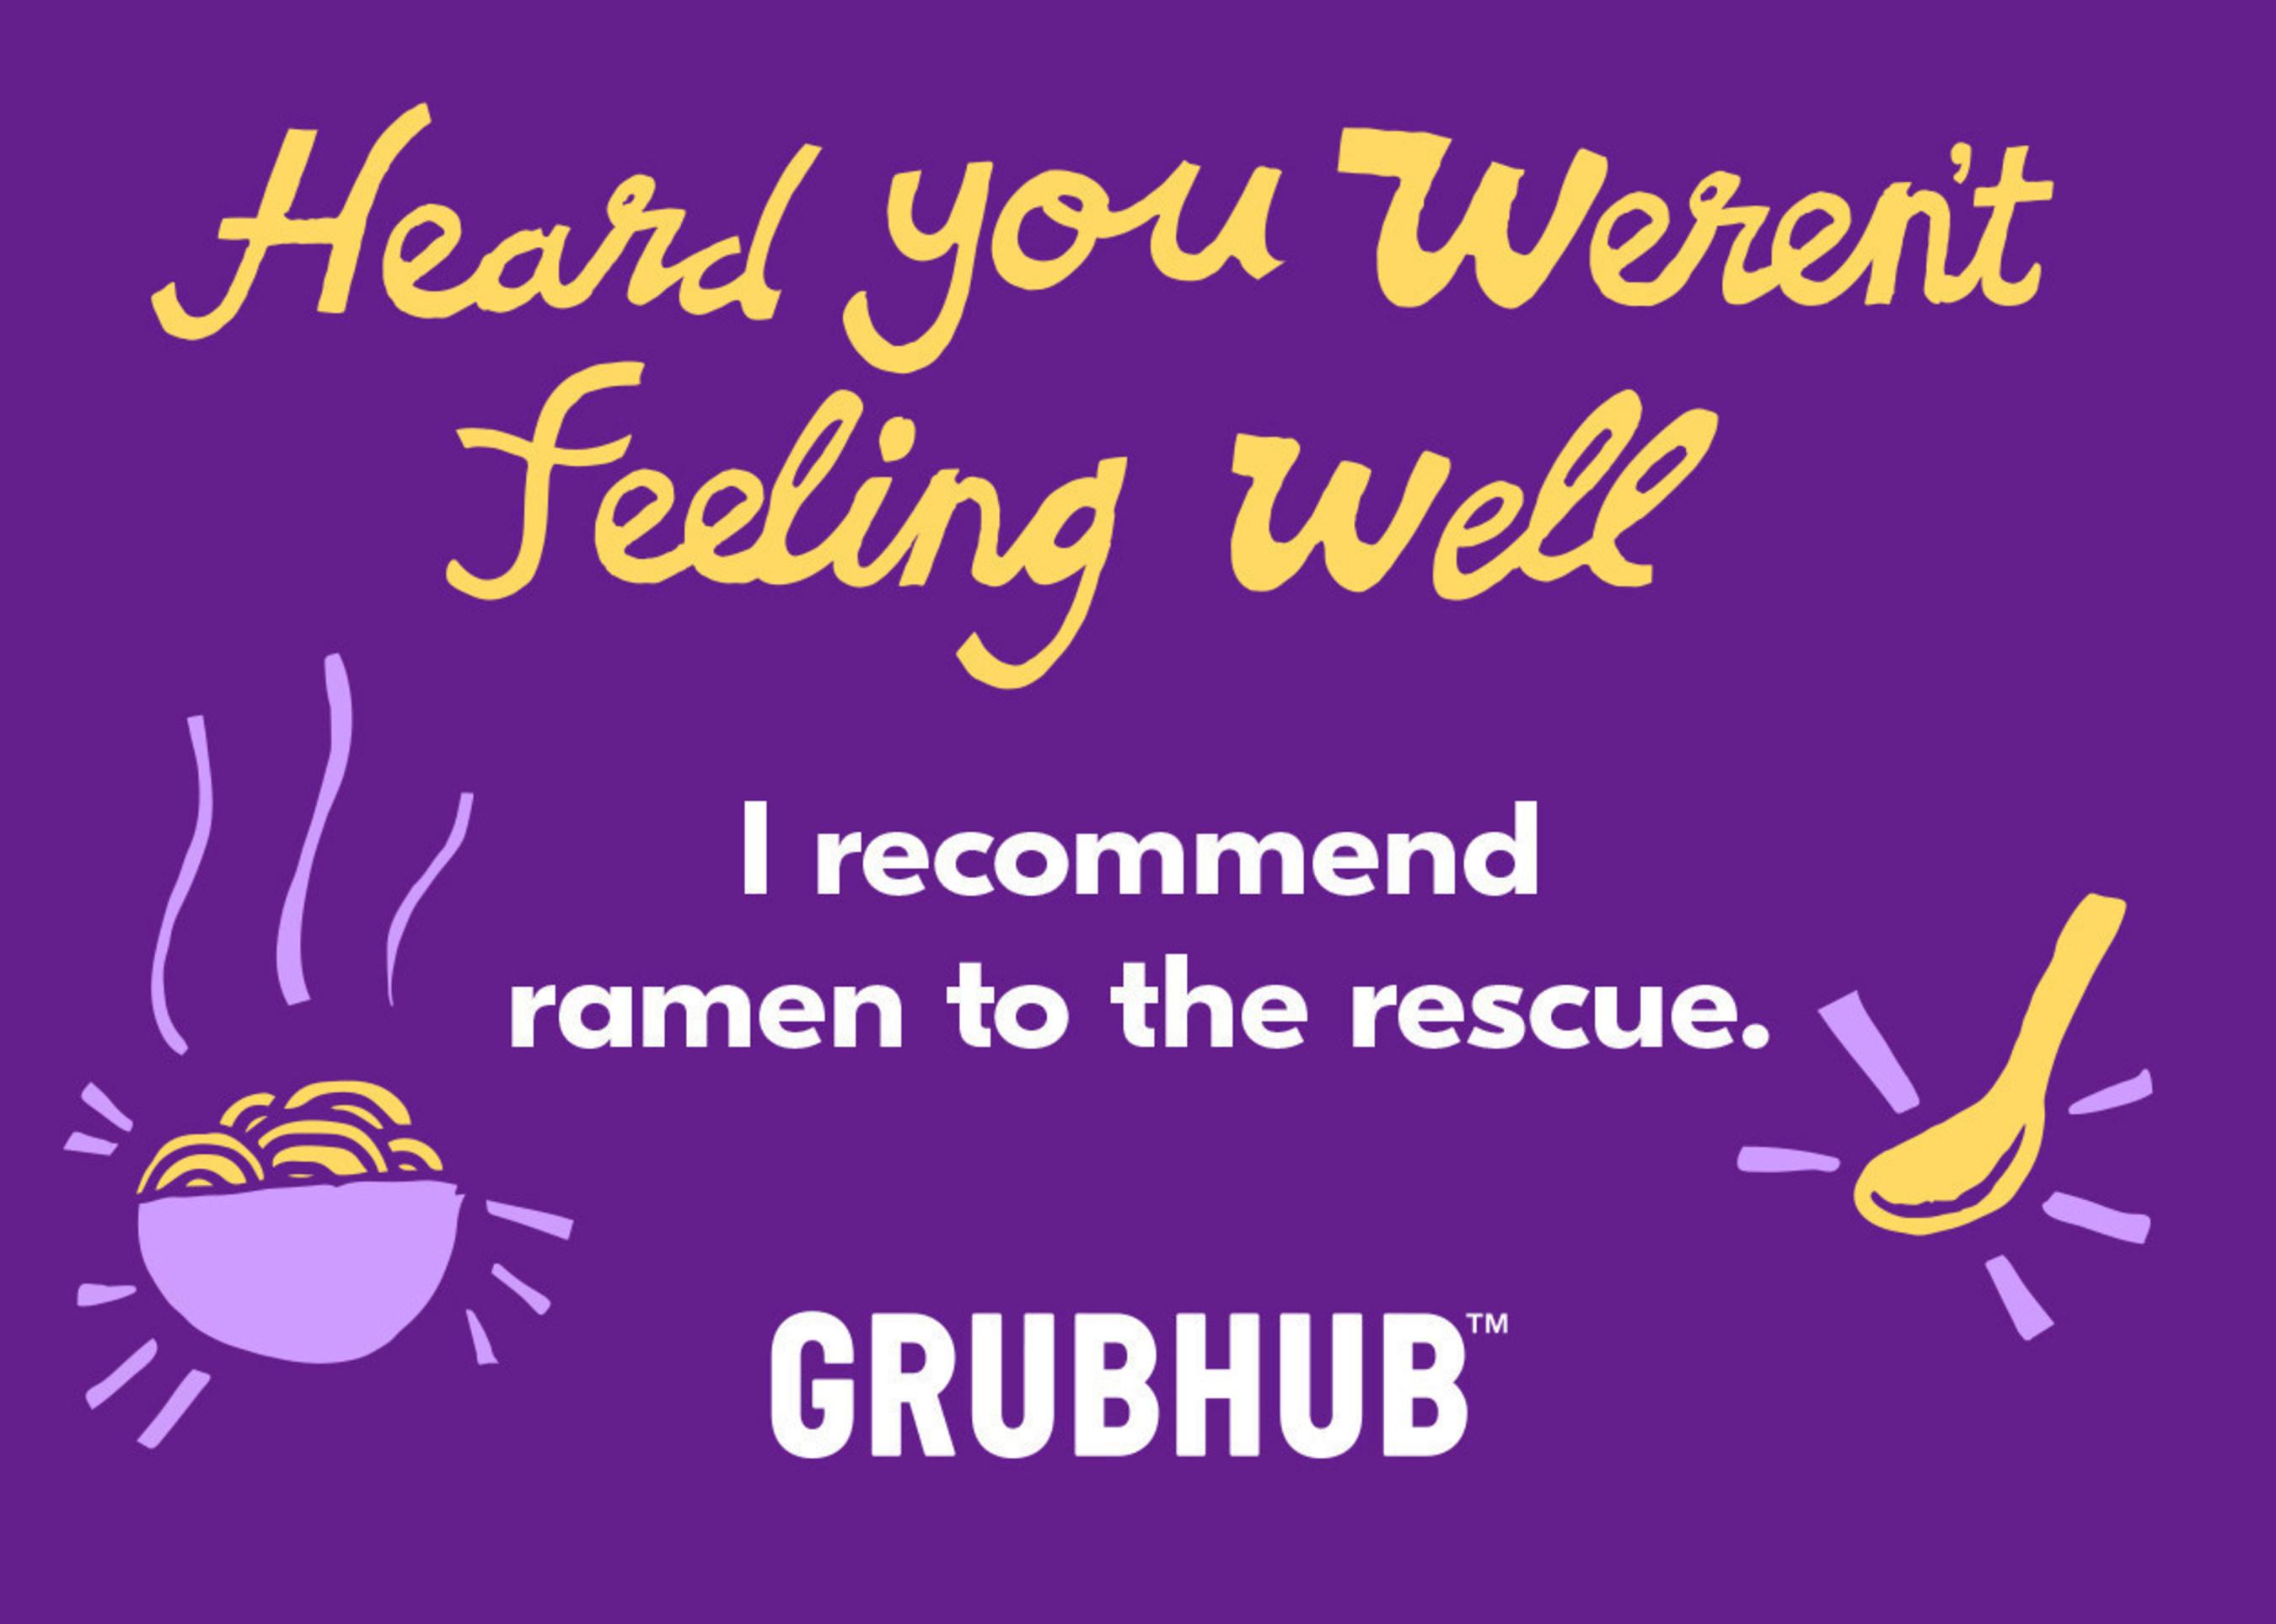 grubhub seamless introduces